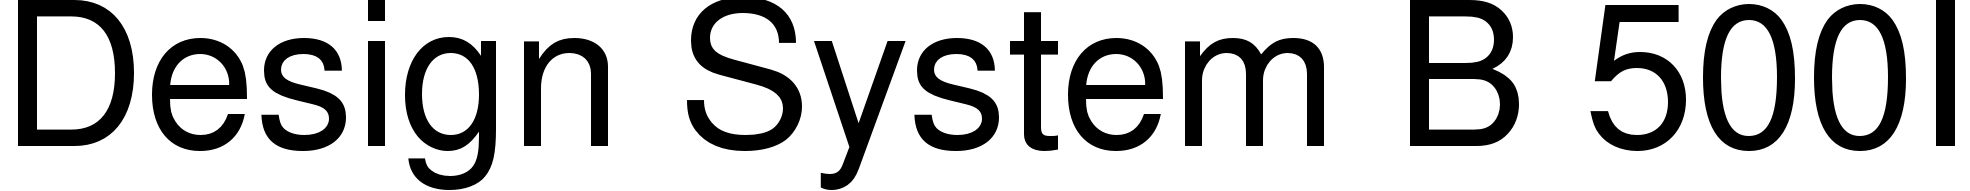 Design System B 500I